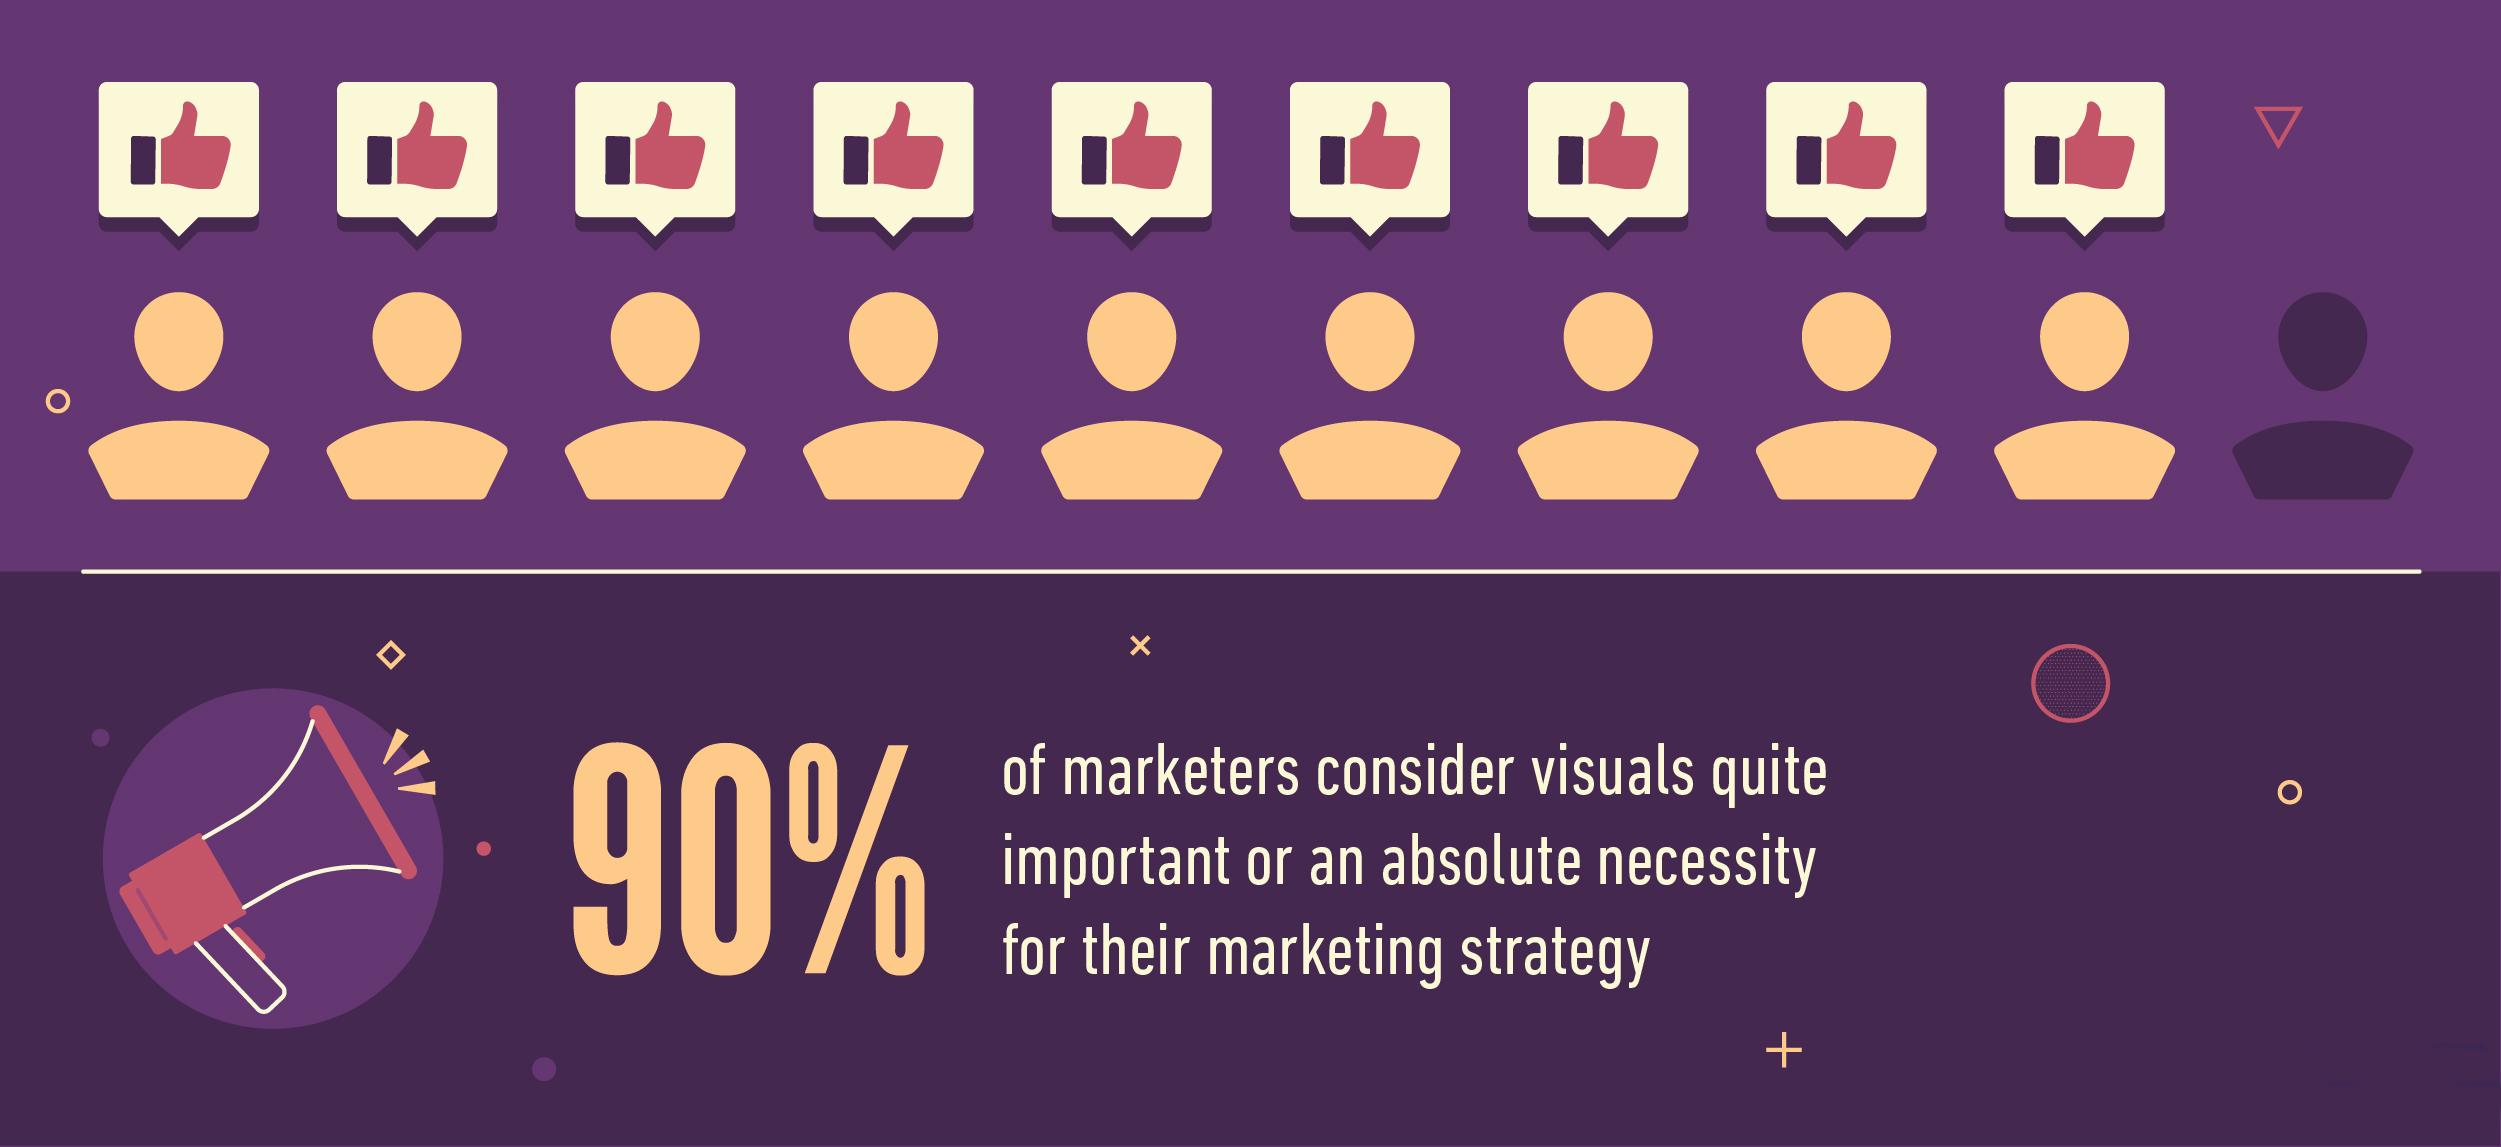 Visual marketing strategy statistic